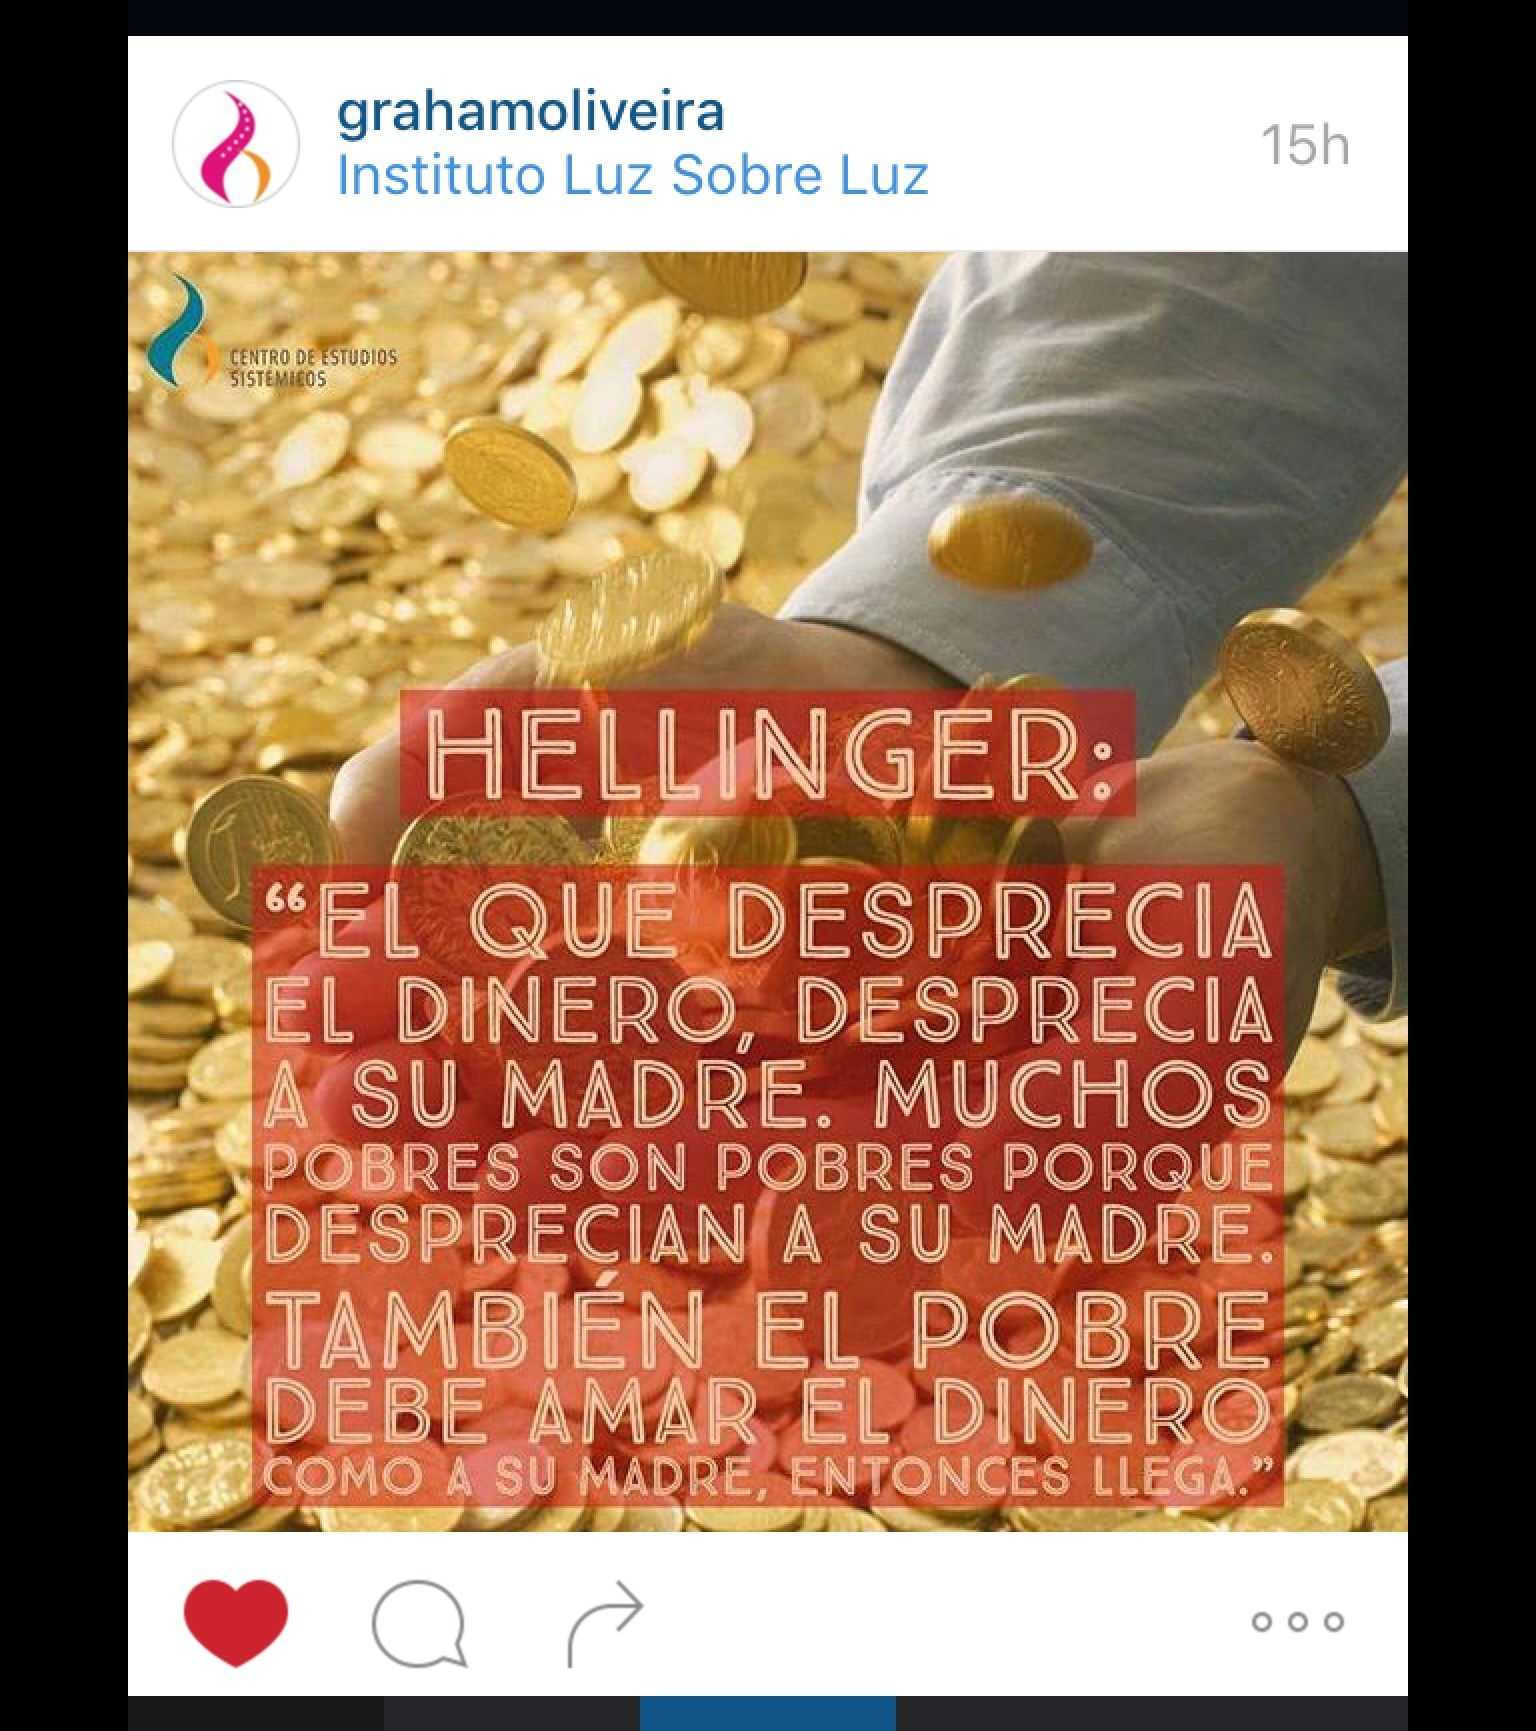 Madre dinero carrera | CONSTELACIONES | Pinterest | Carrera ...